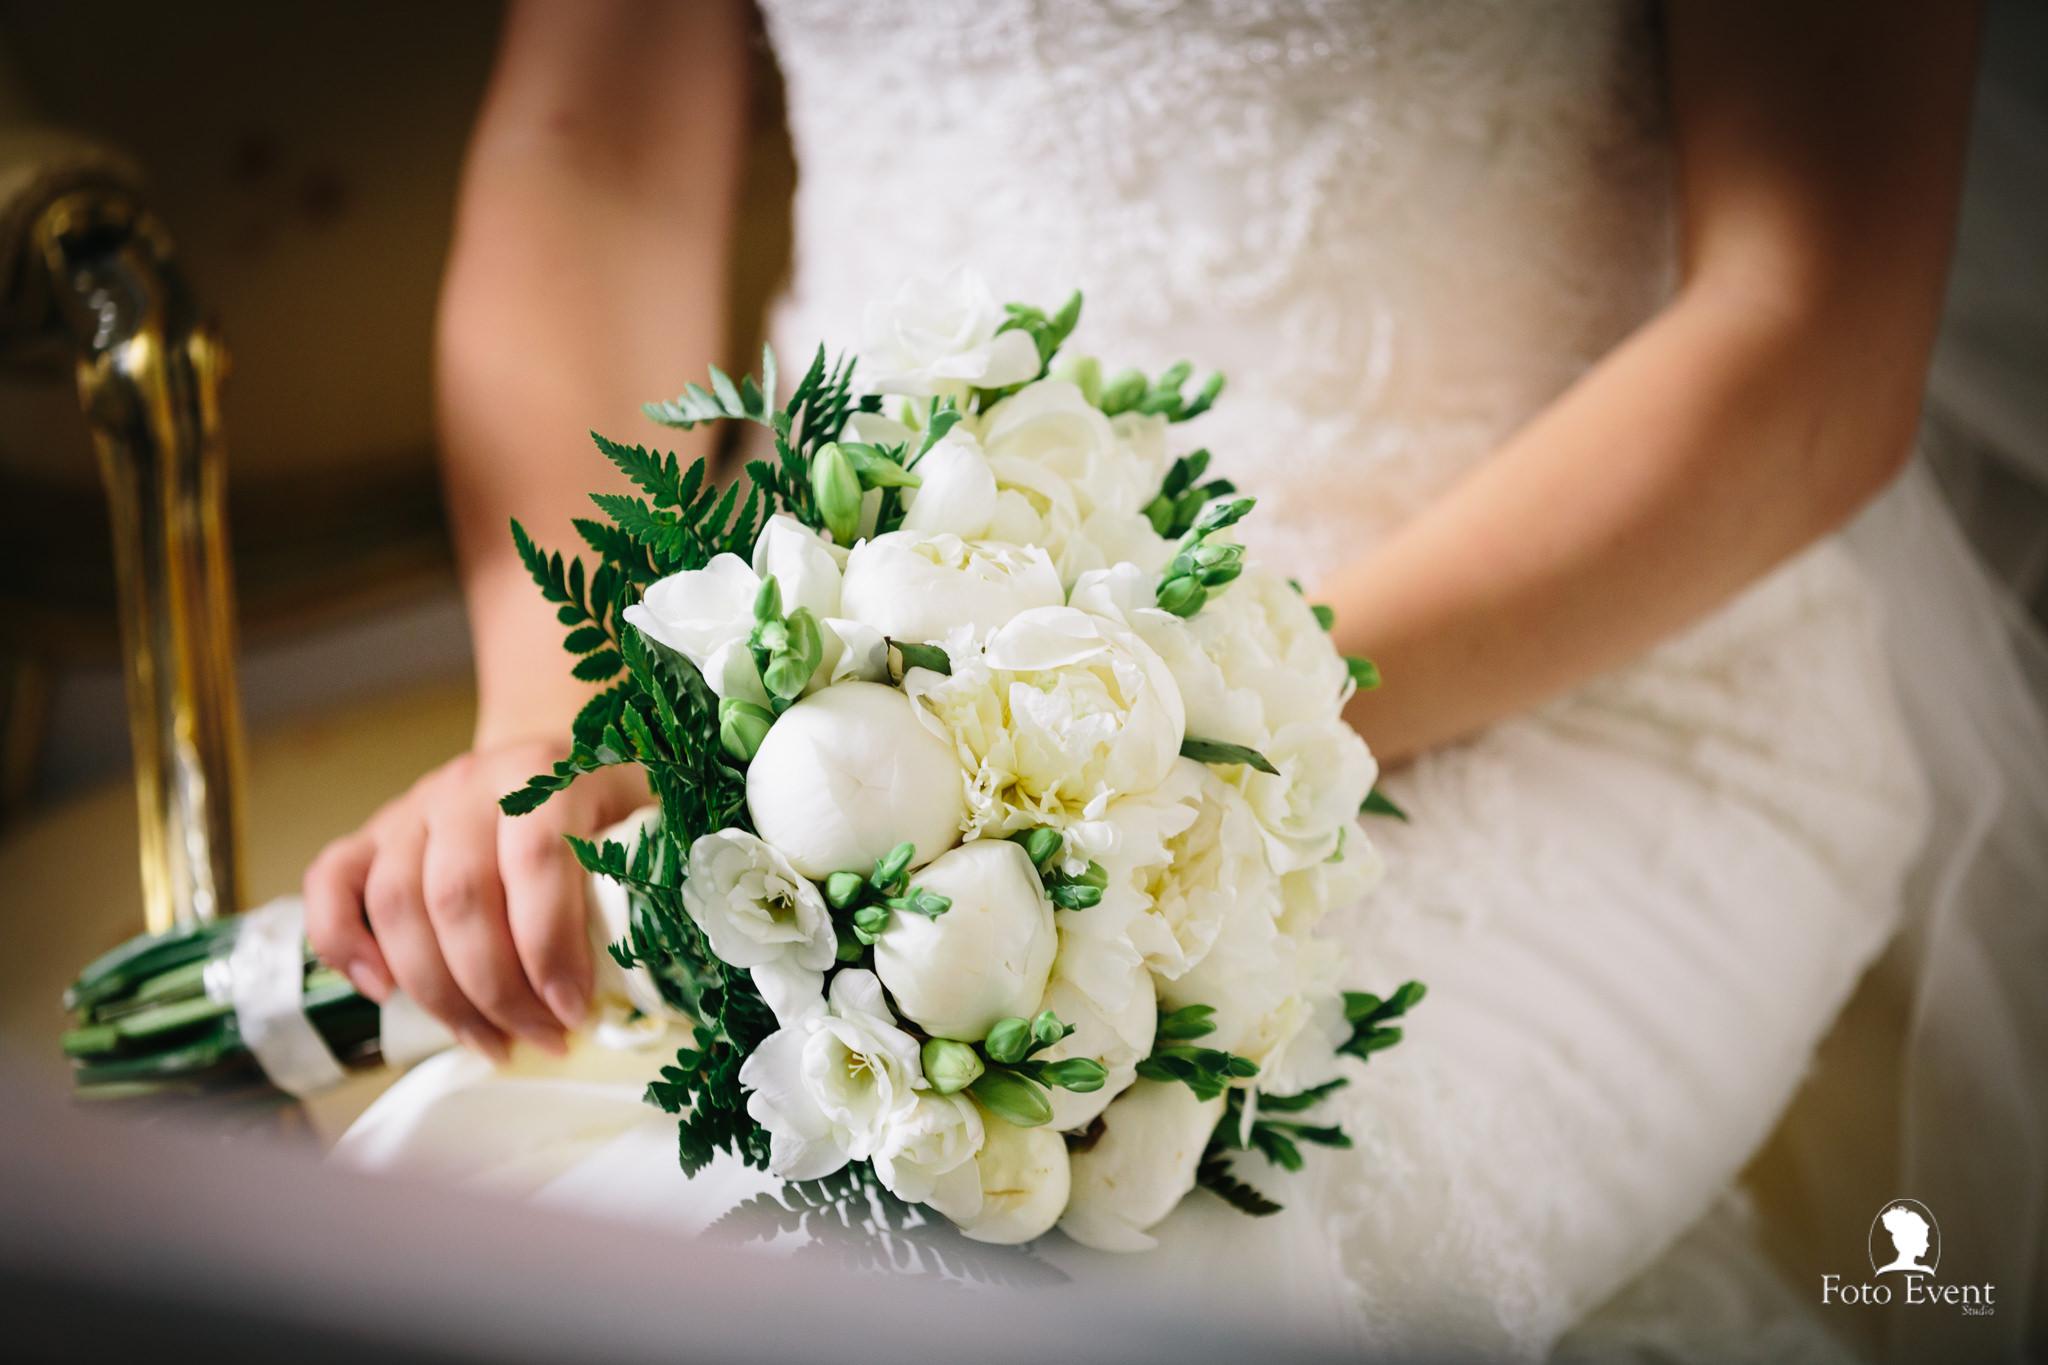 025-2019-08-31-Matrimonio-Serena-e-Saverio-Tarantino-zoom-224